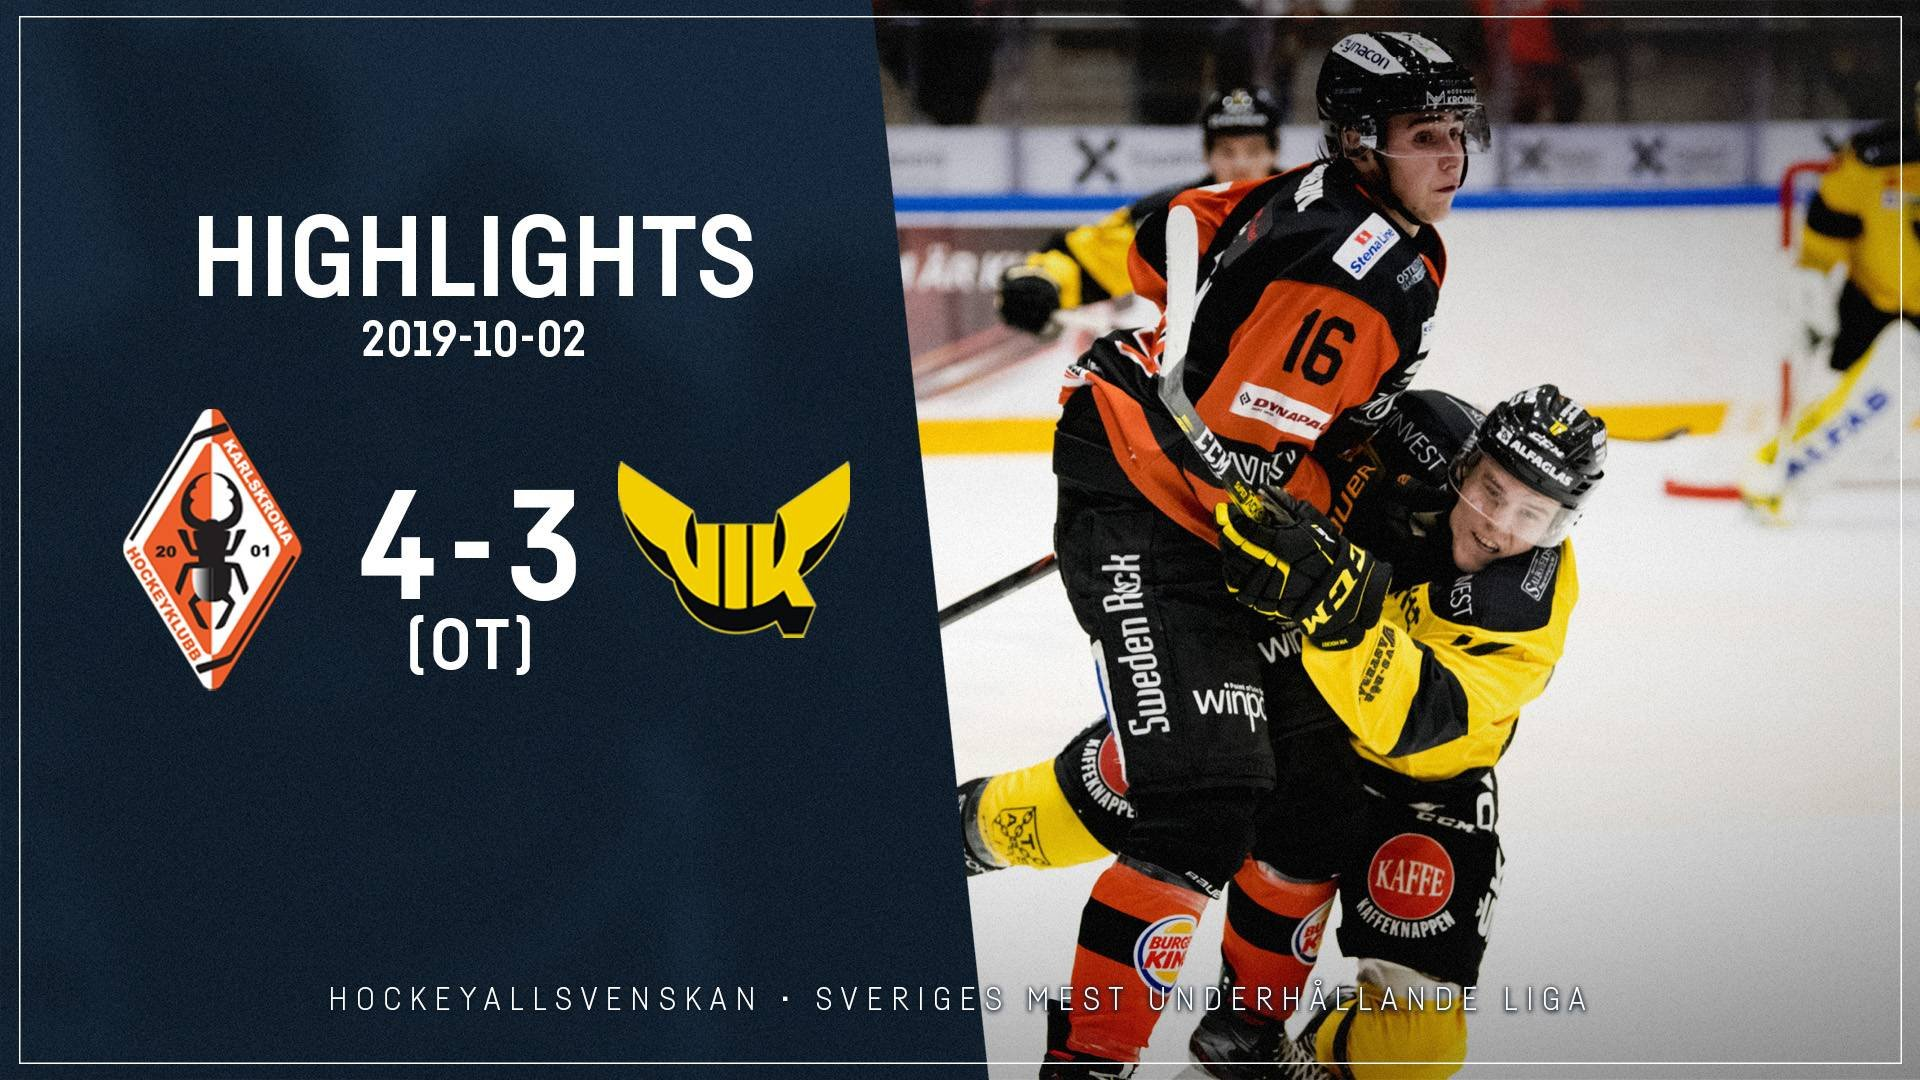 2019-10-02 Karlskrona - Västerås 4-3 (OT)